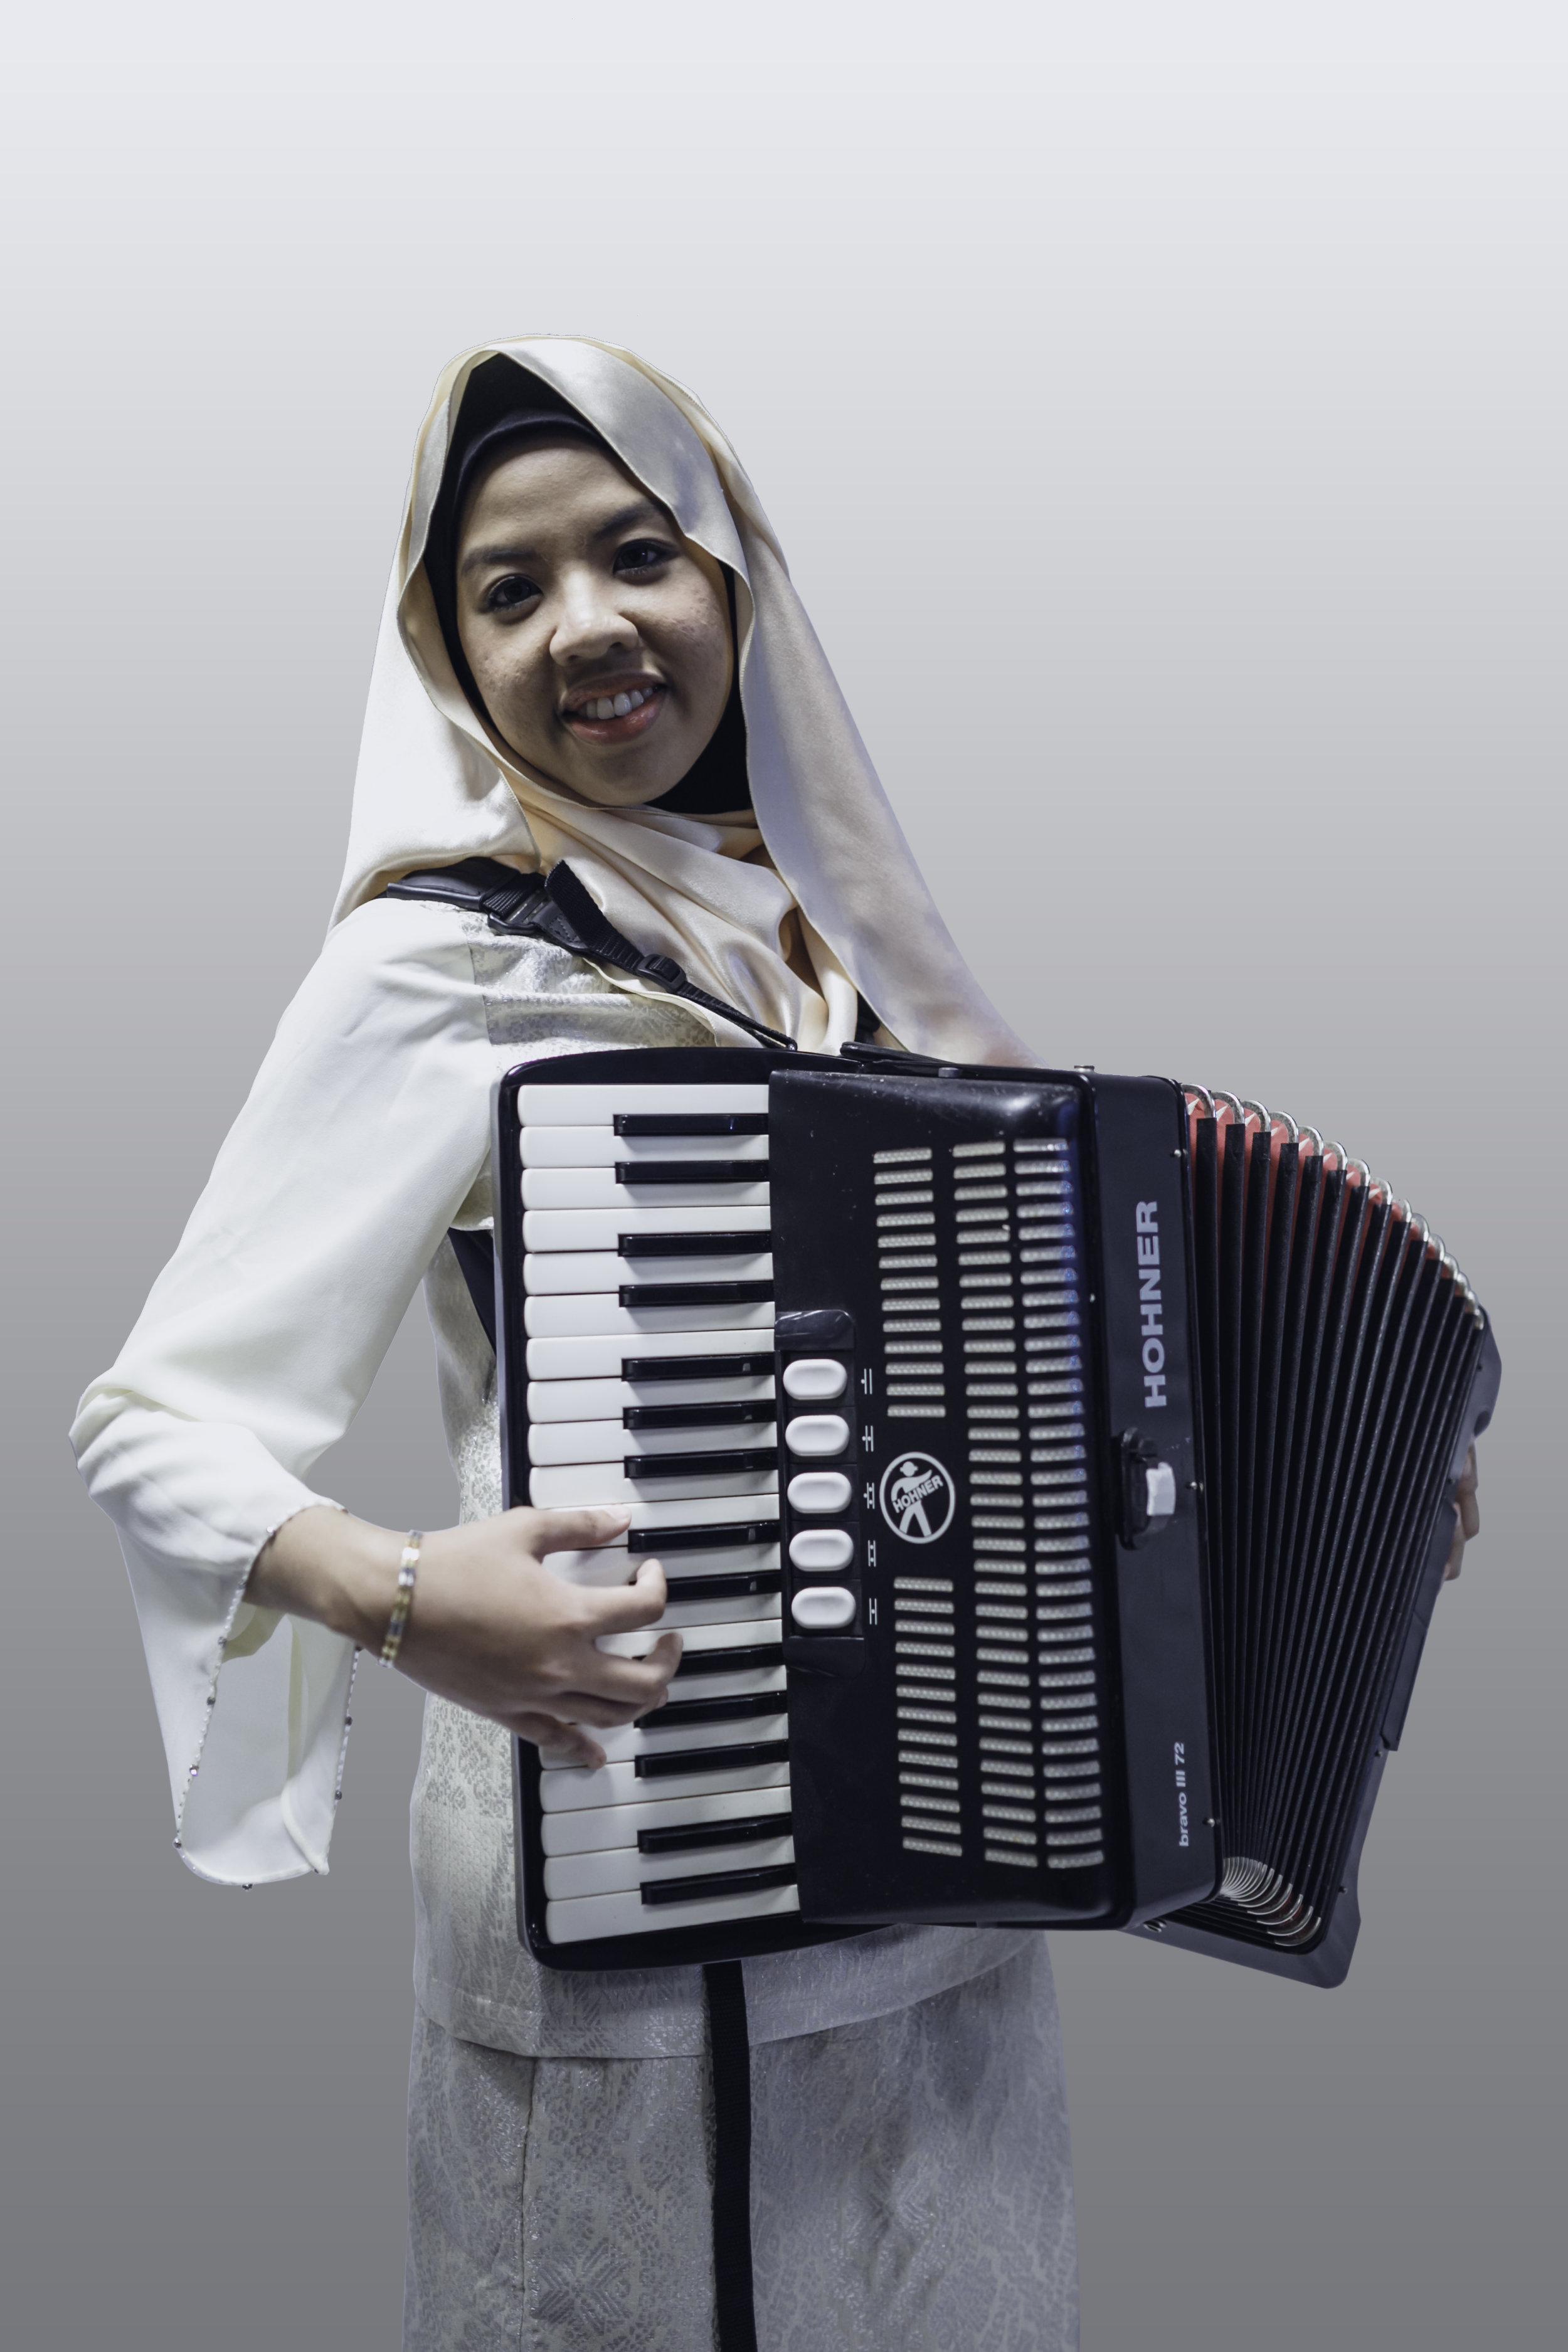 Syafiqah 'Adha Sallehin (Composition)